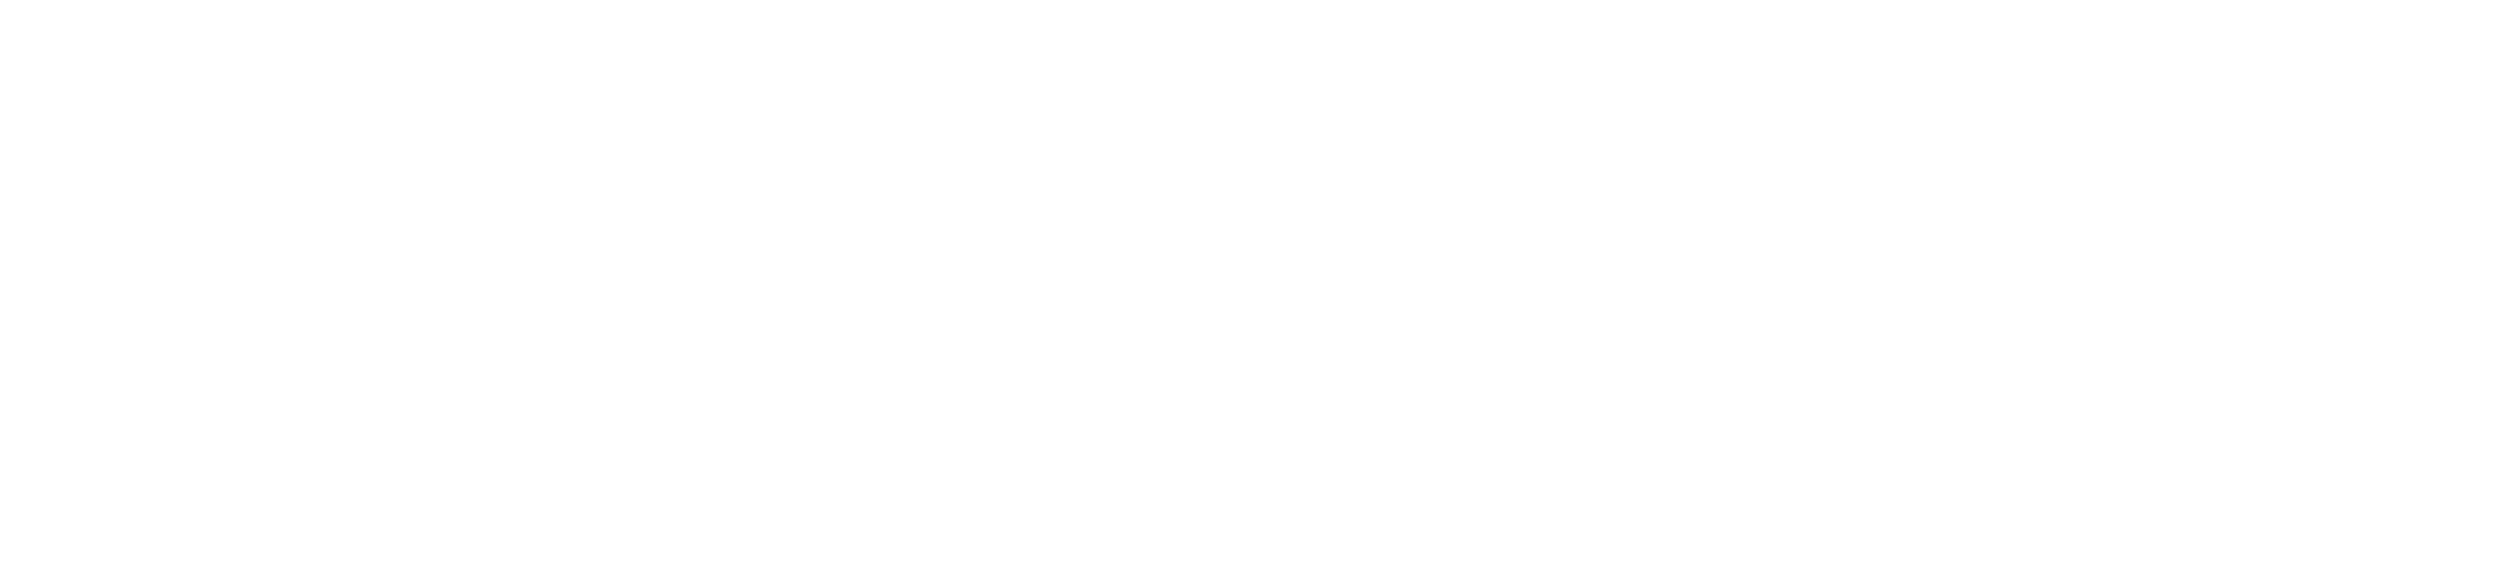 logo-bliss-white-widerrr.png